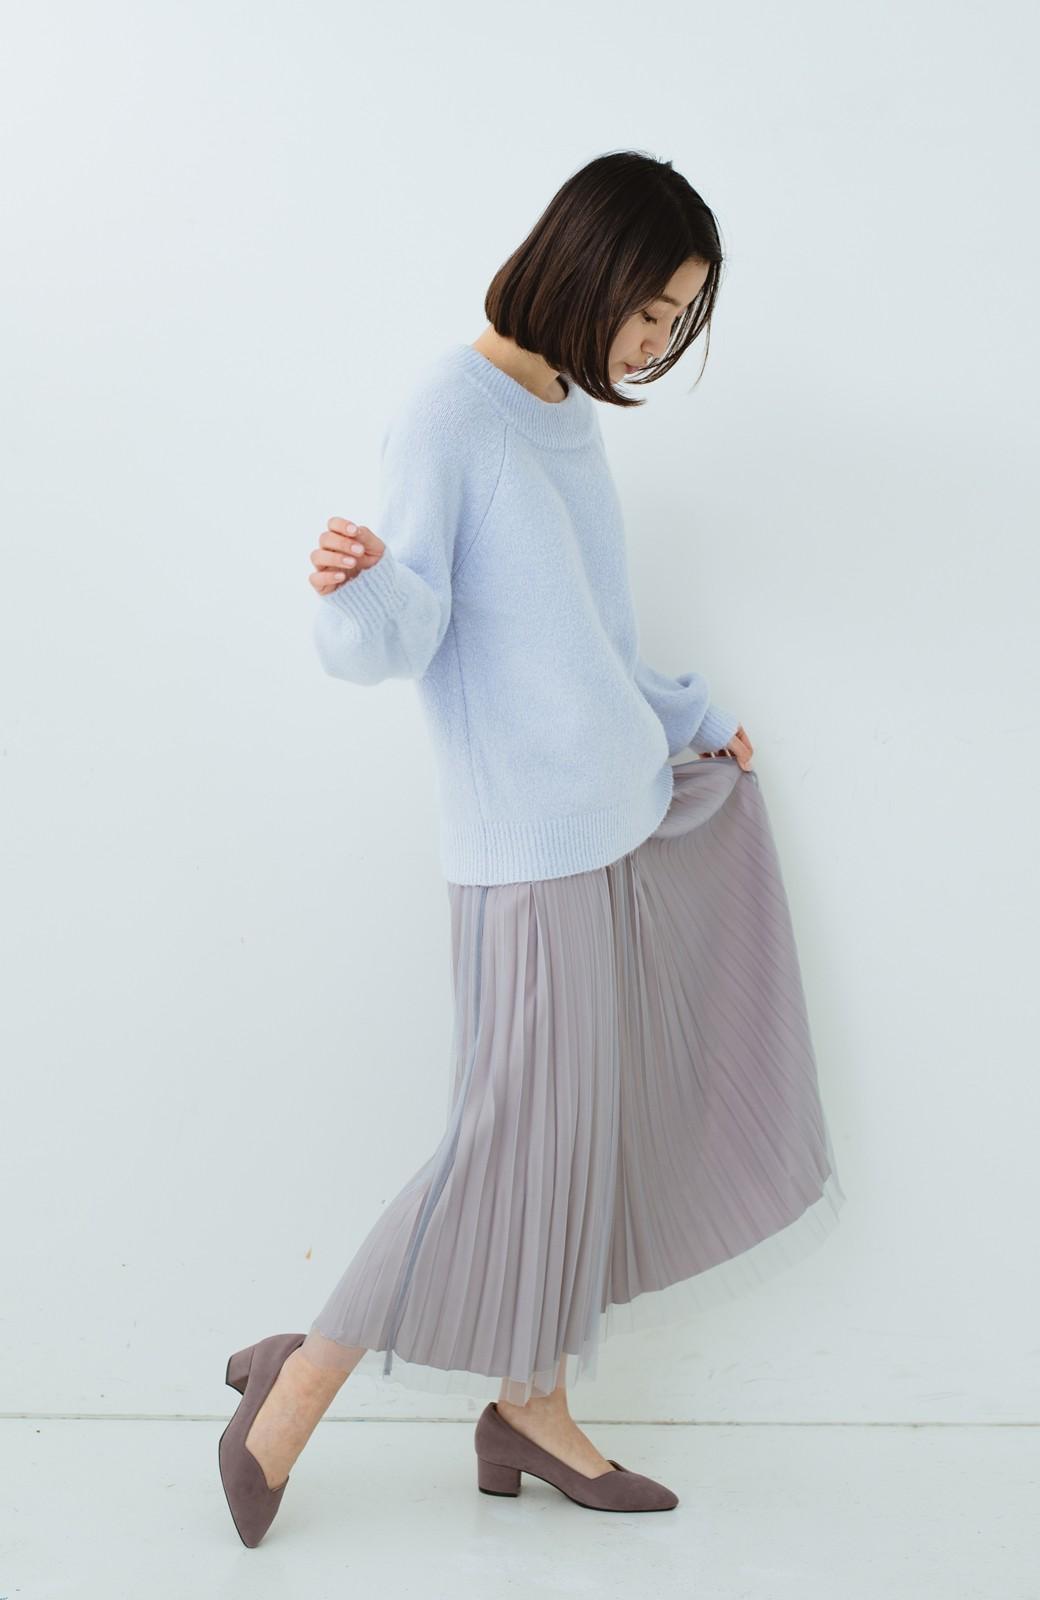 haco! どんな日も華やか気分にしてくれる 二枚仕立てのチュールプリーツスカート <ライトグレー>の商品写真20